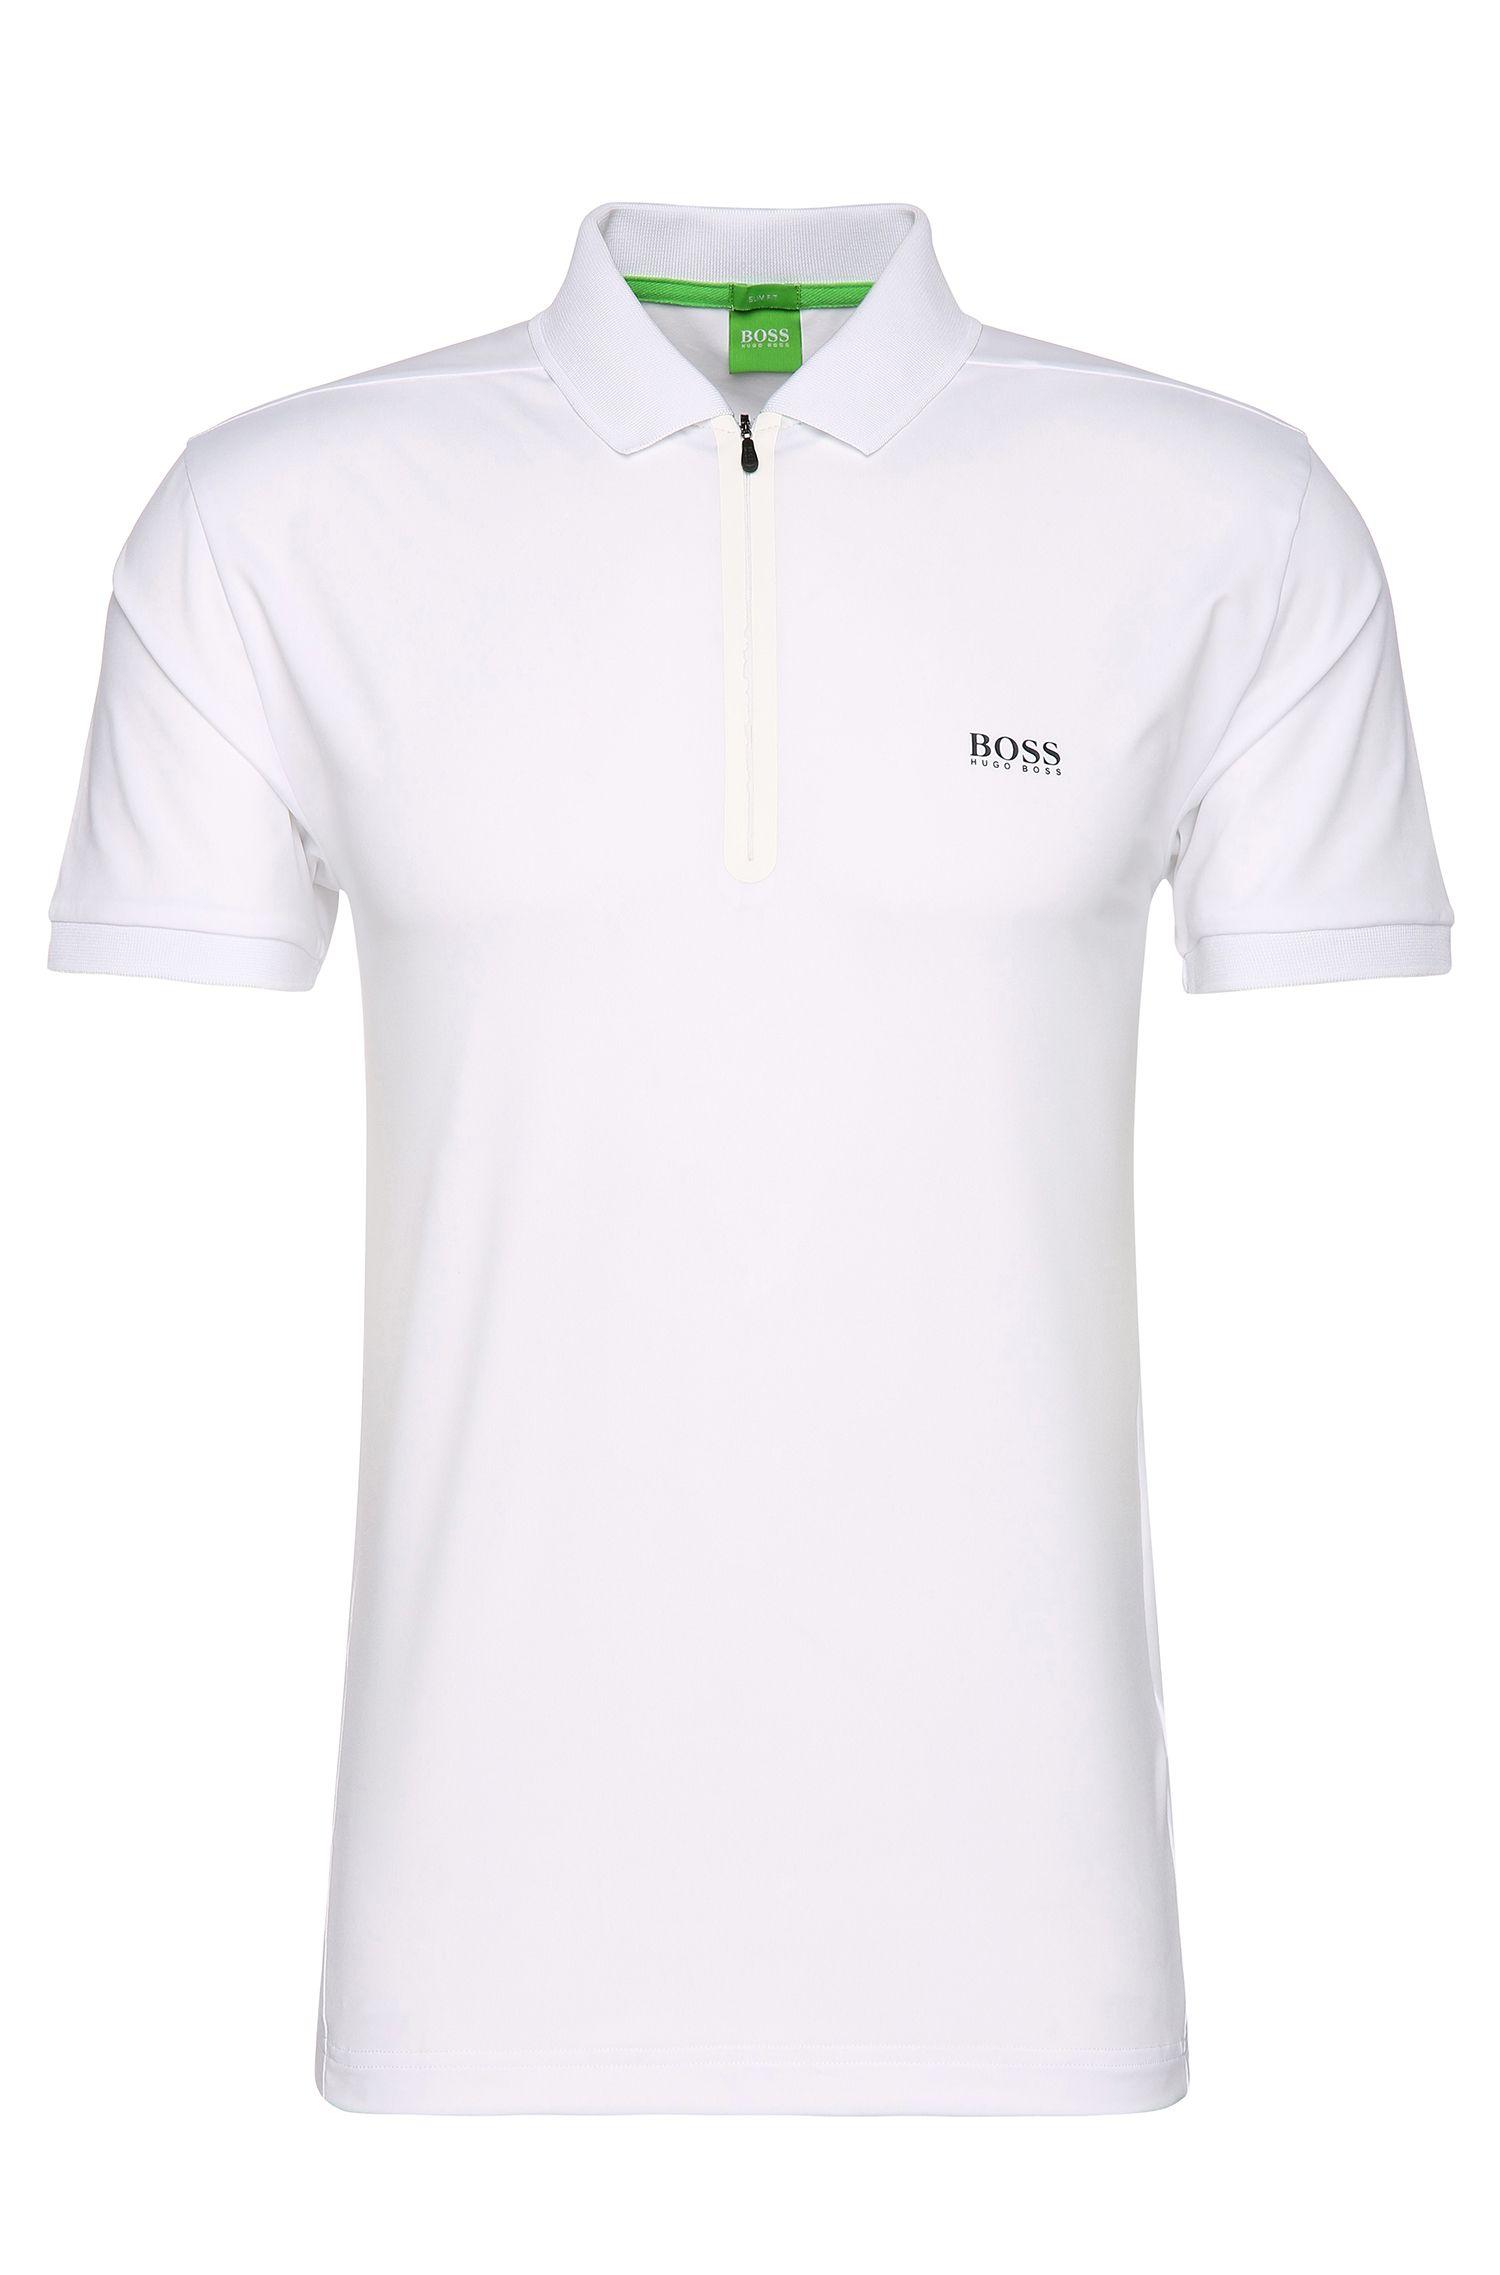 Stretch Techno Jersey Polo Shirt, Slim Fit | Pavotech